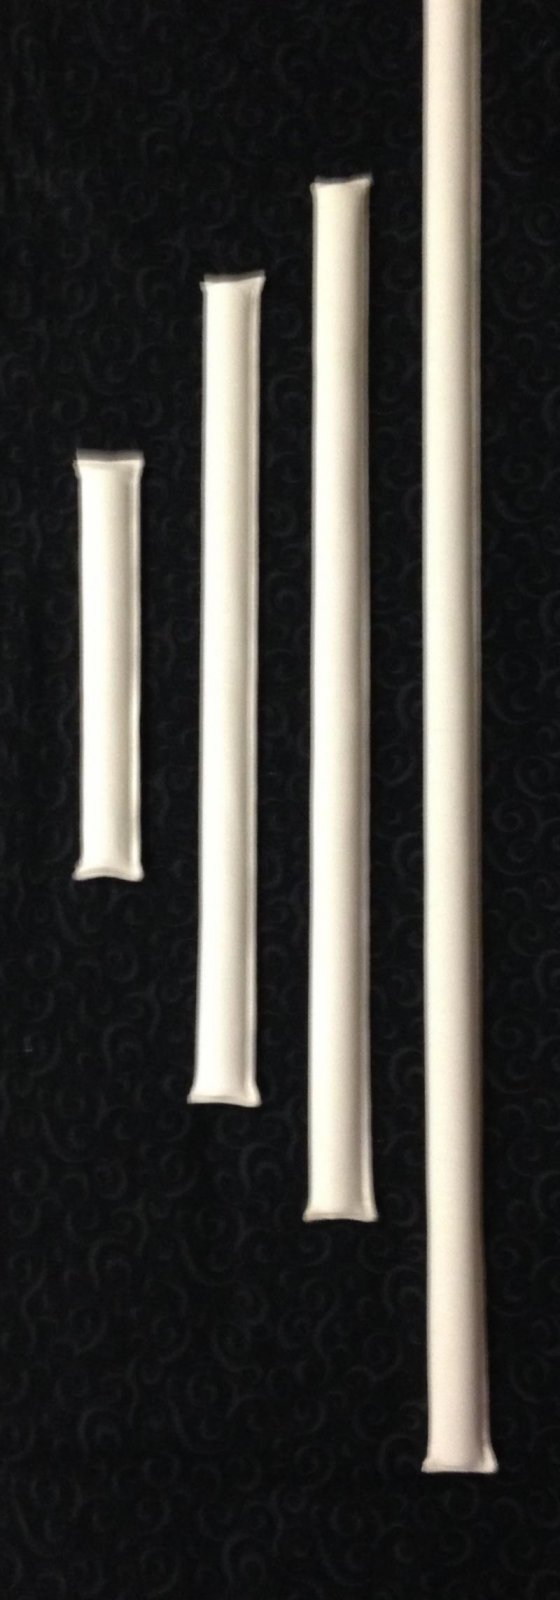 Strip Stick Fat Quarter 22 5 721762329580